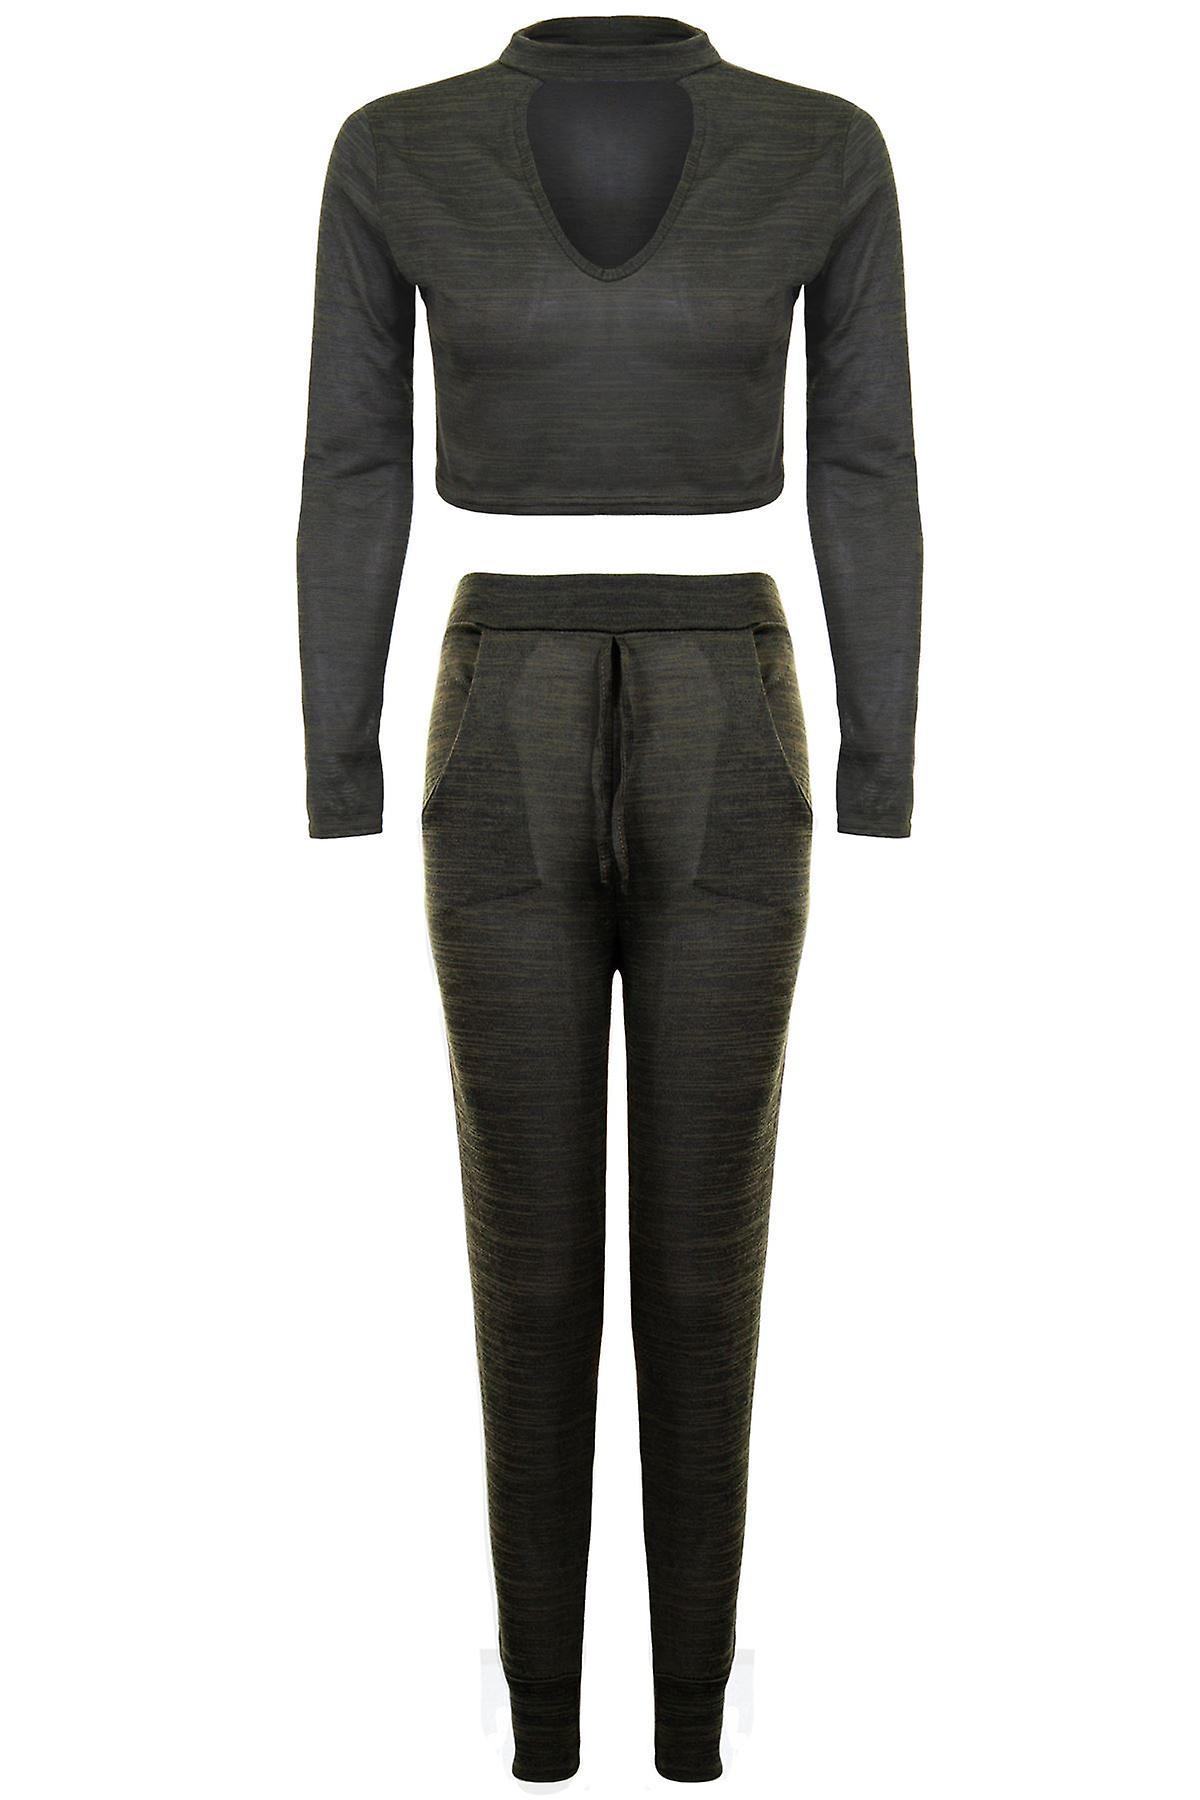 Ladies Choker V Neck Long Sleeve Crop Top Joggers Lounge Wear Set Tracksuit